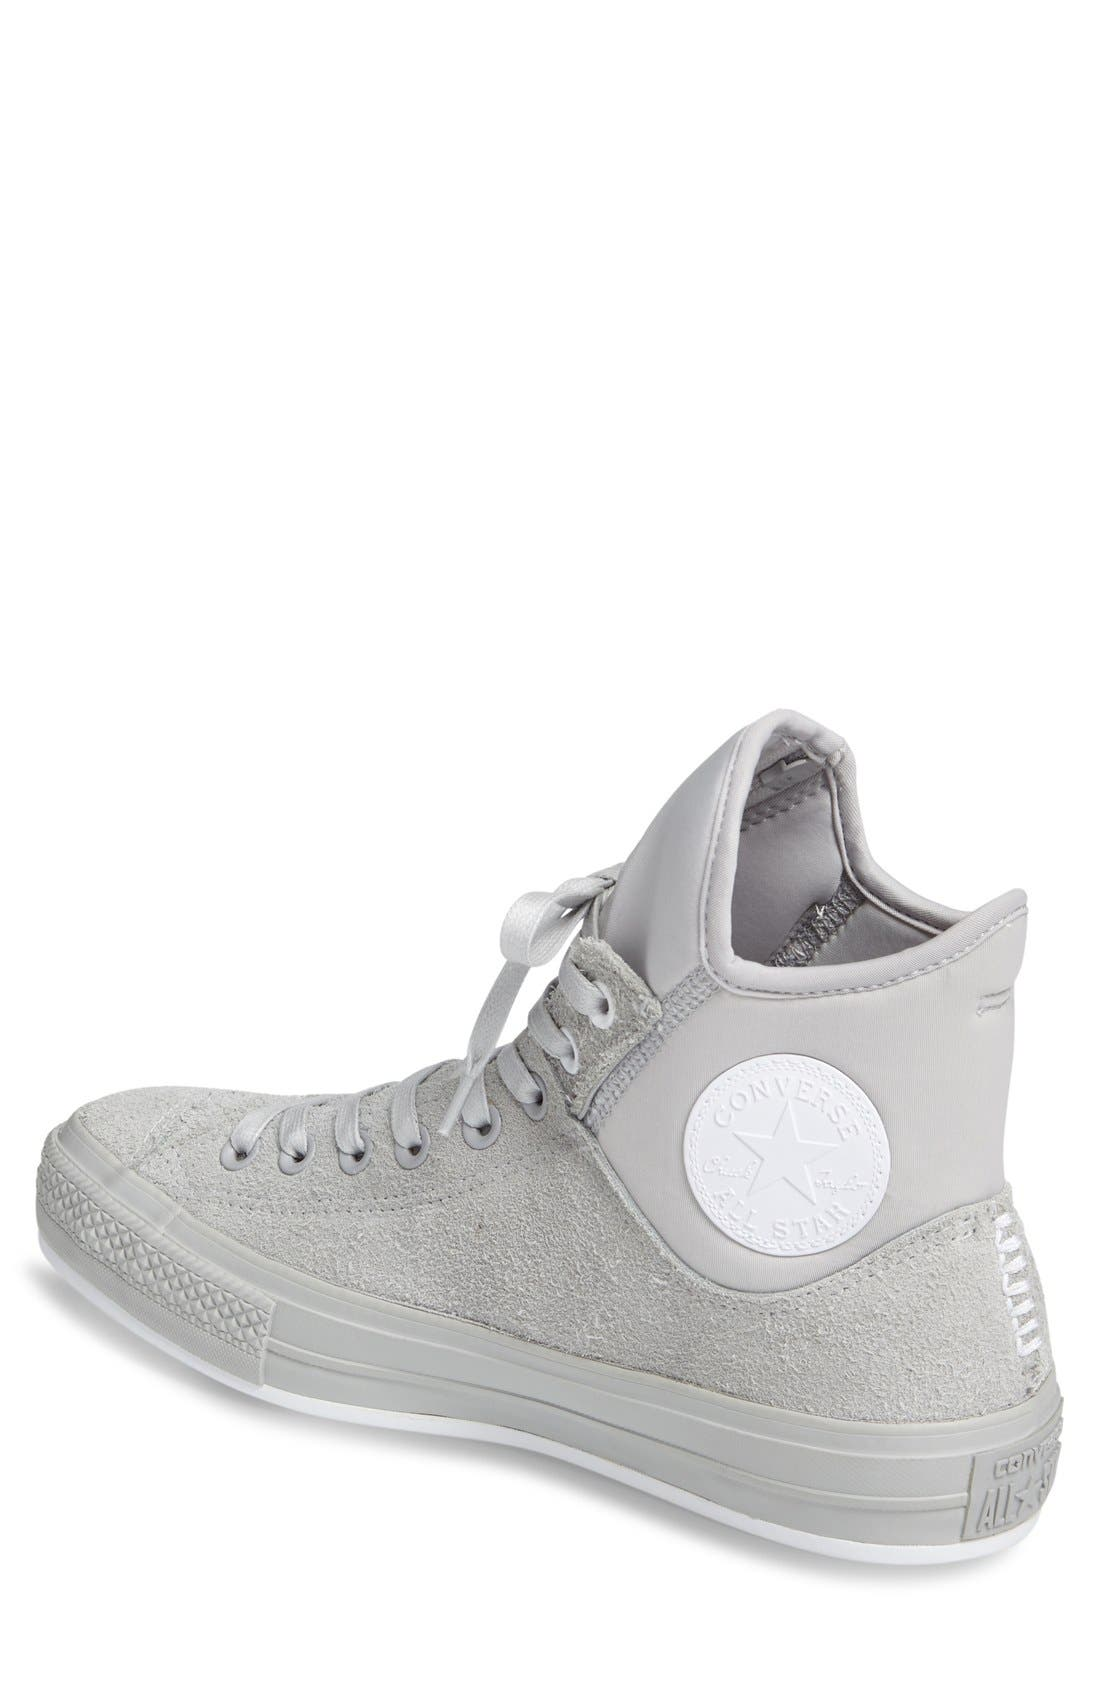 Alternate Image 2  - Converse Chuck Taylor® All Star® MA-1 SE High Top Sneaker (Men)